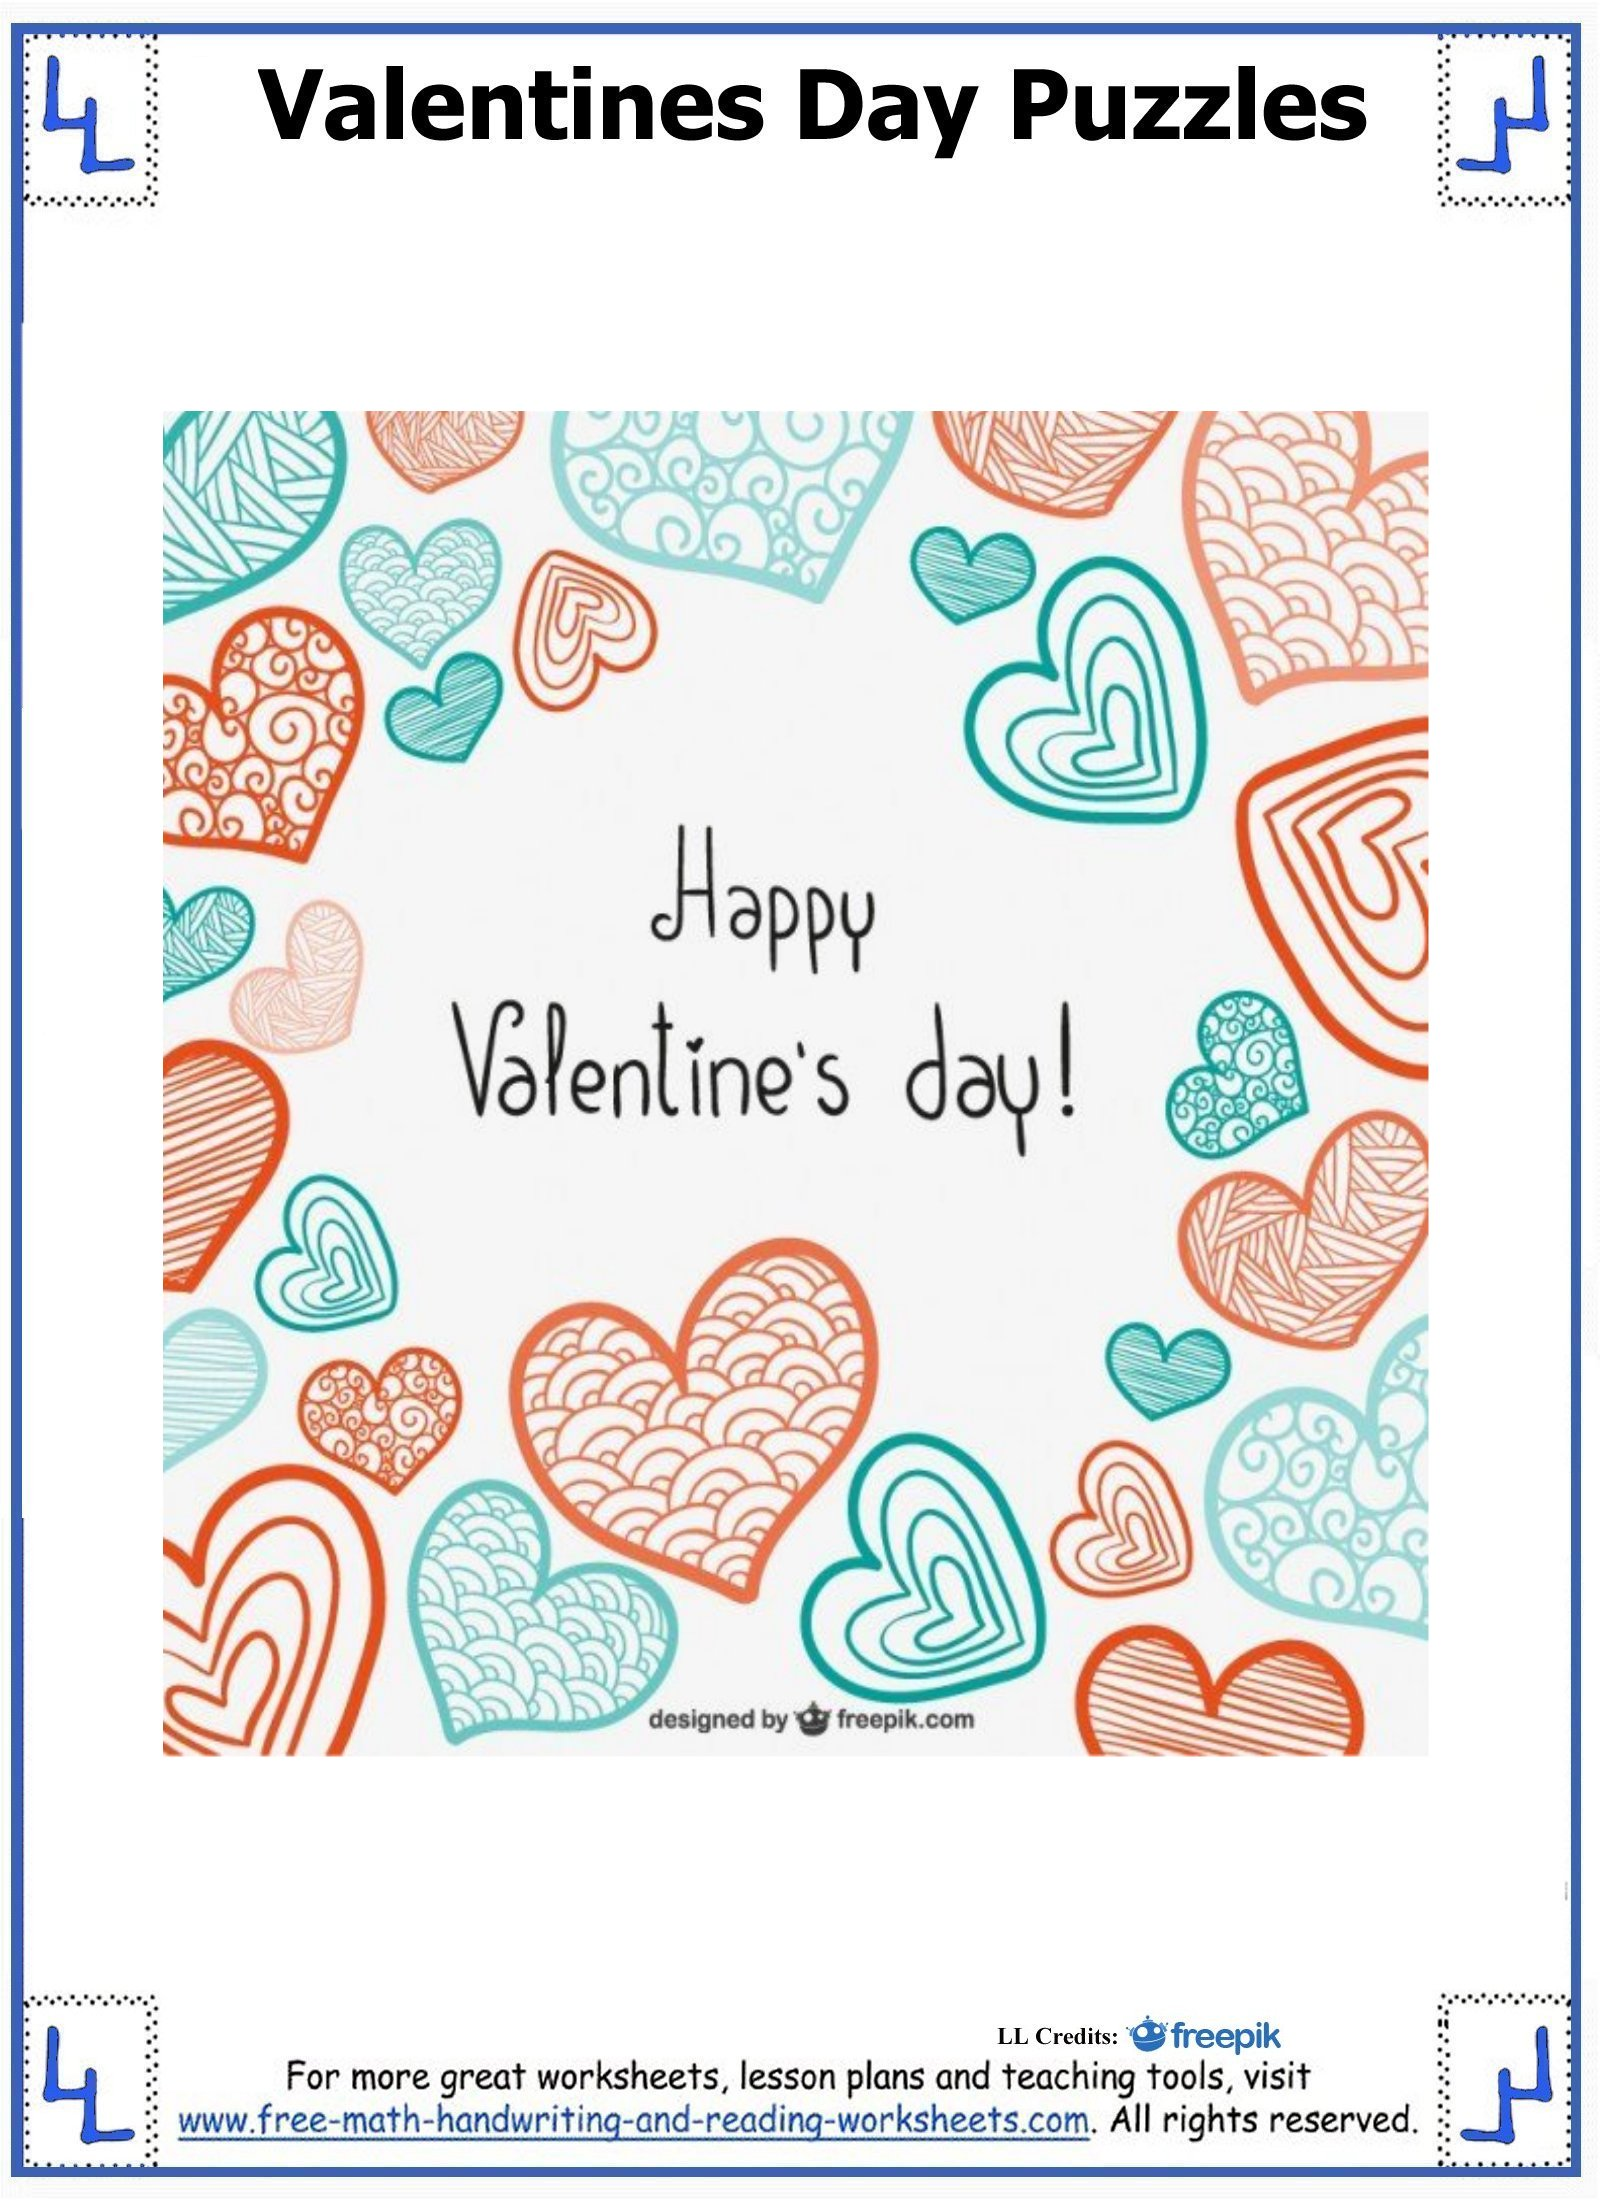 Valentine Day Puzzles